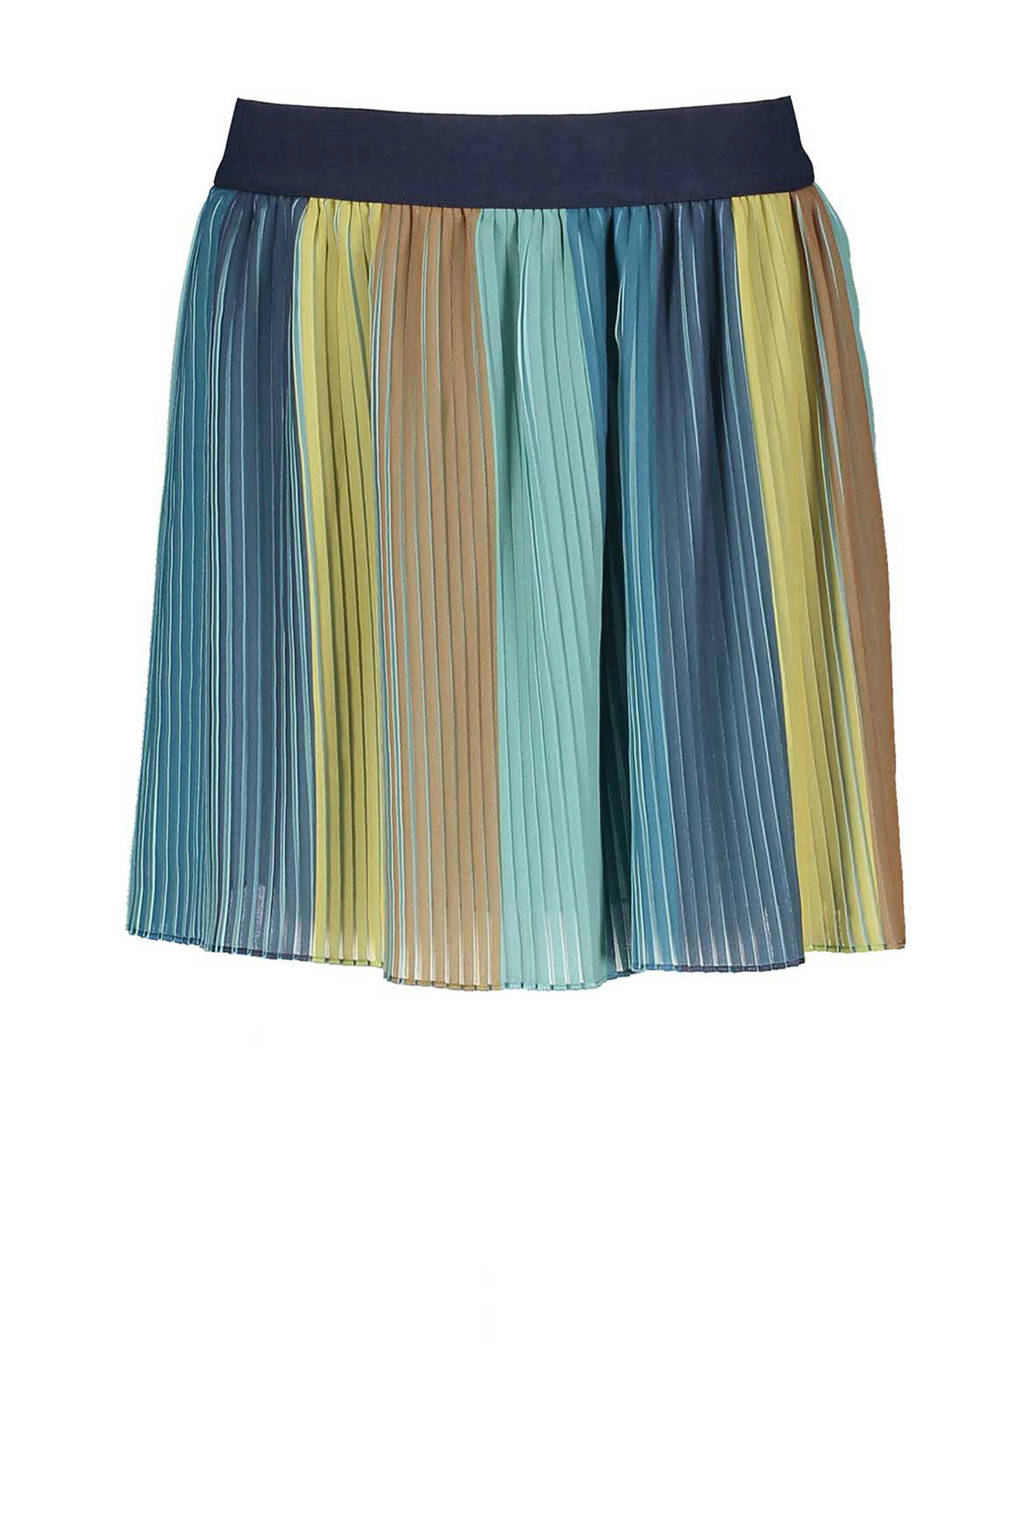 Sissy-Boy gestreepte plissé rok blauw, Blauw/geel